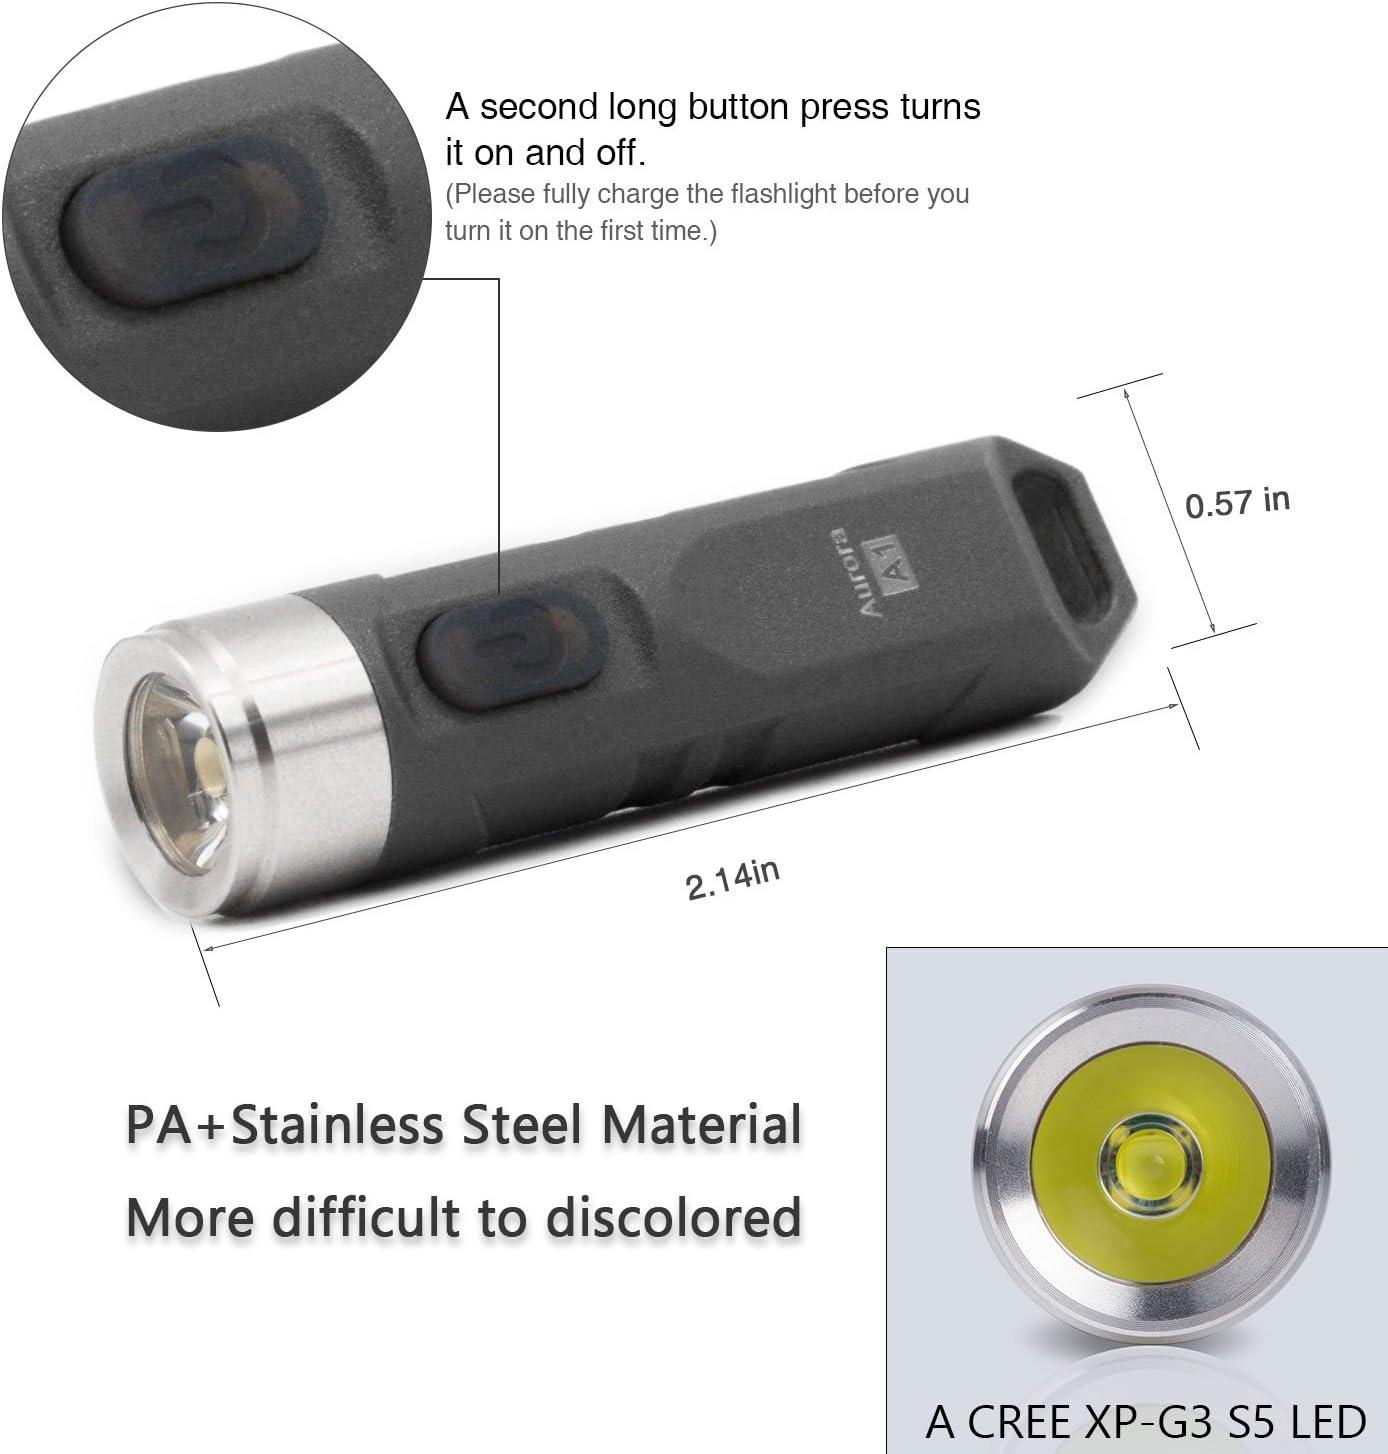 550 Lumens Outdoor Mini Edc Rechargeable High Brig Rovyvon Aurora Luminous Body